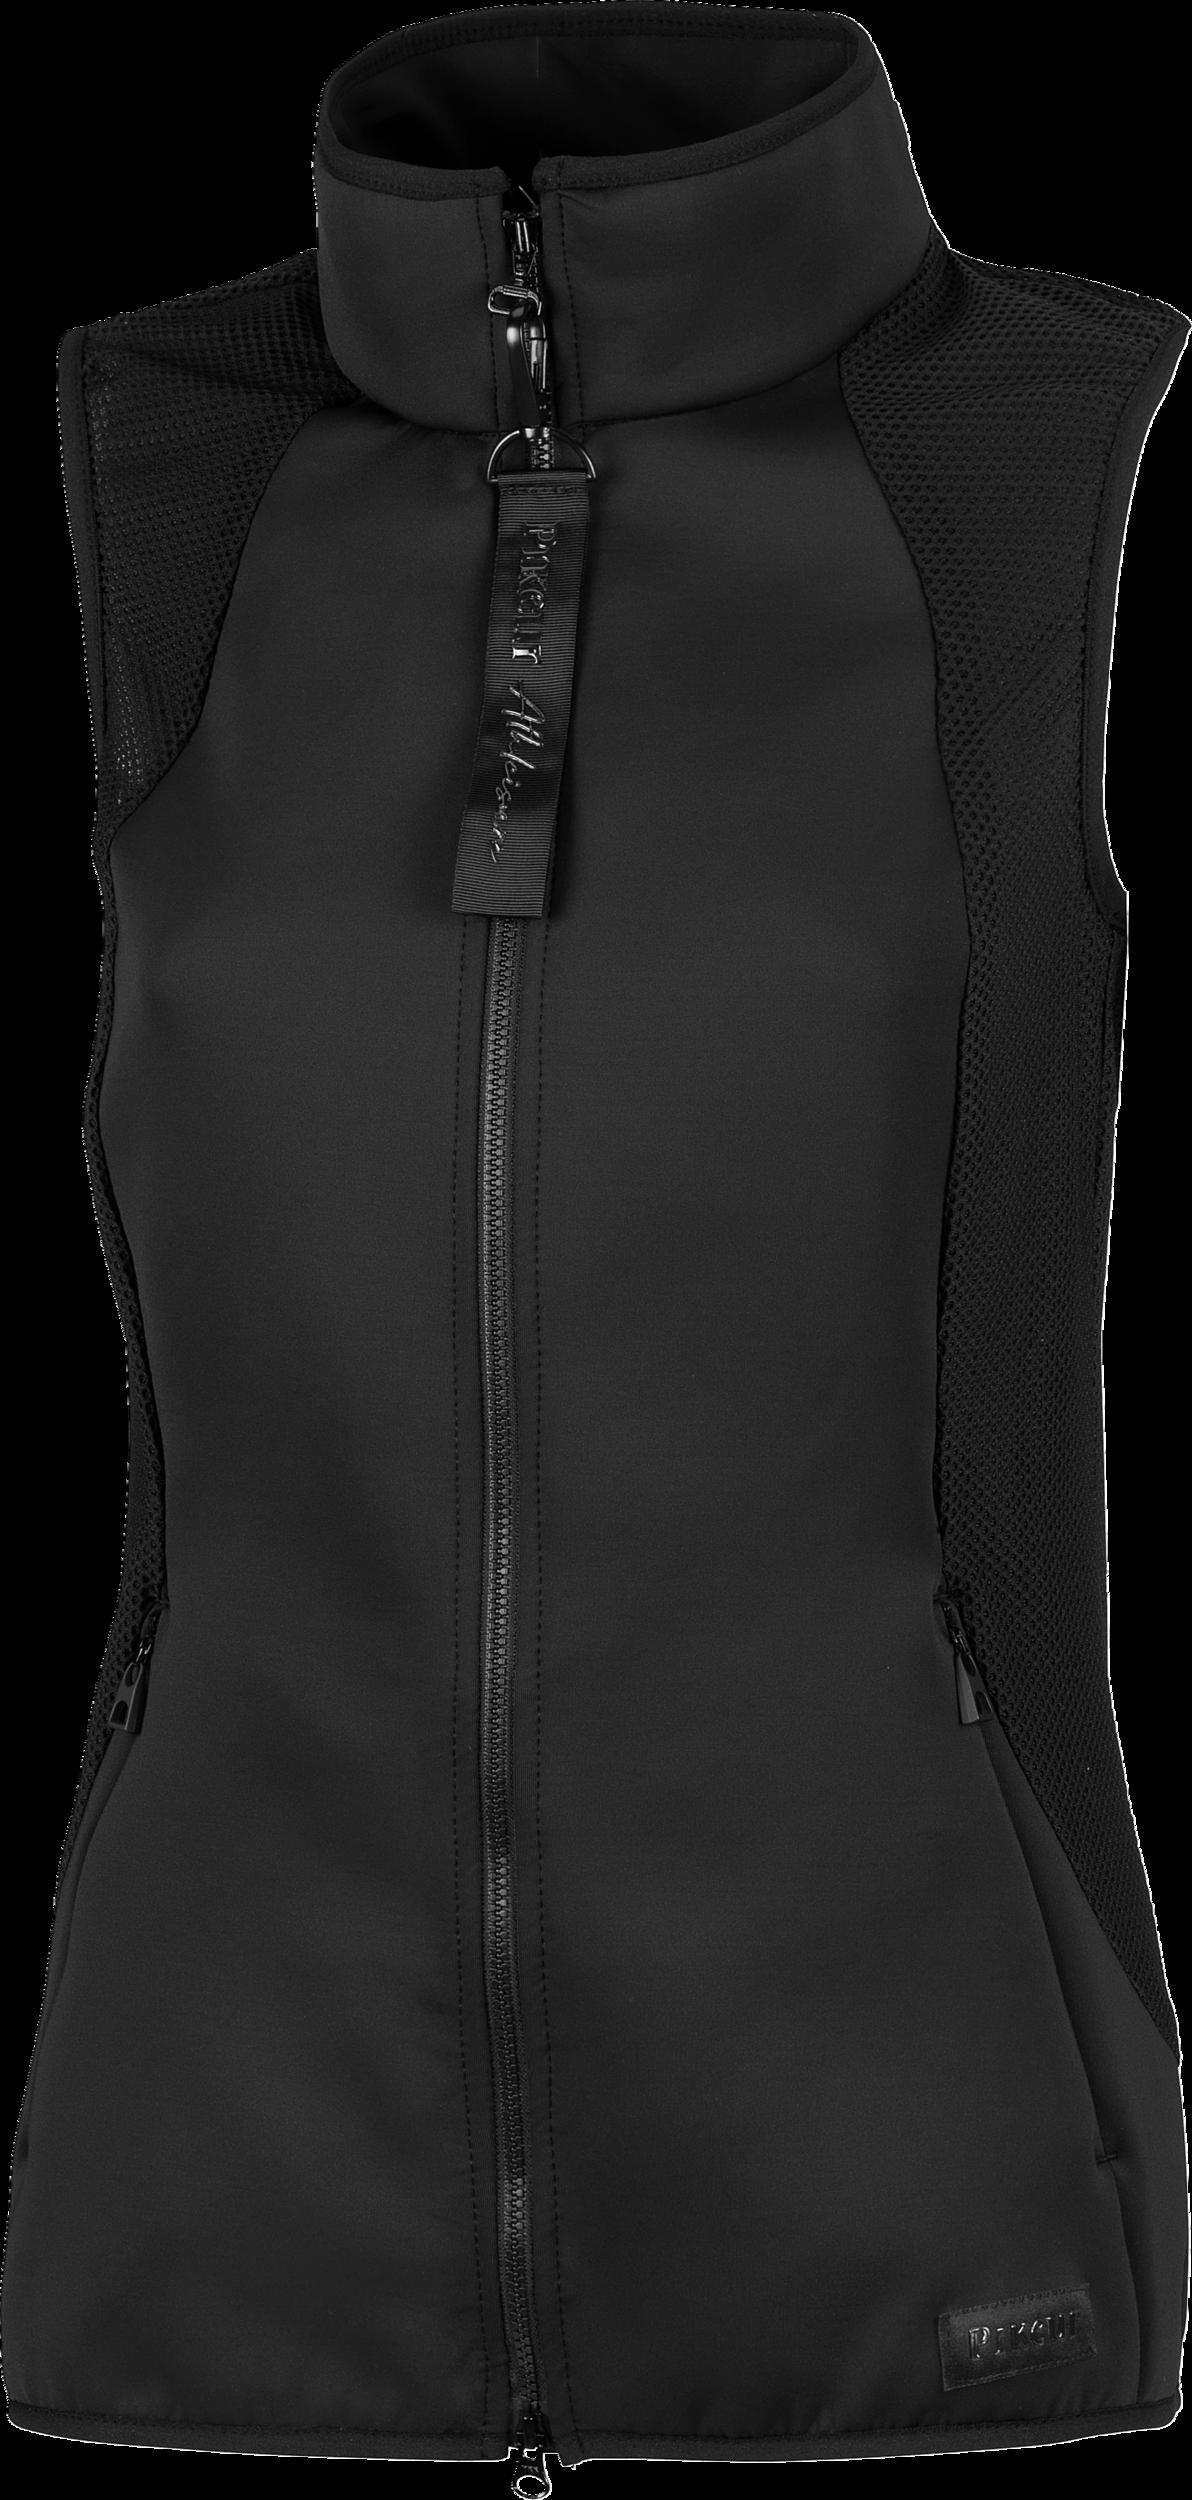 Pikeur Lin Black Waistcoat Bodywarmer